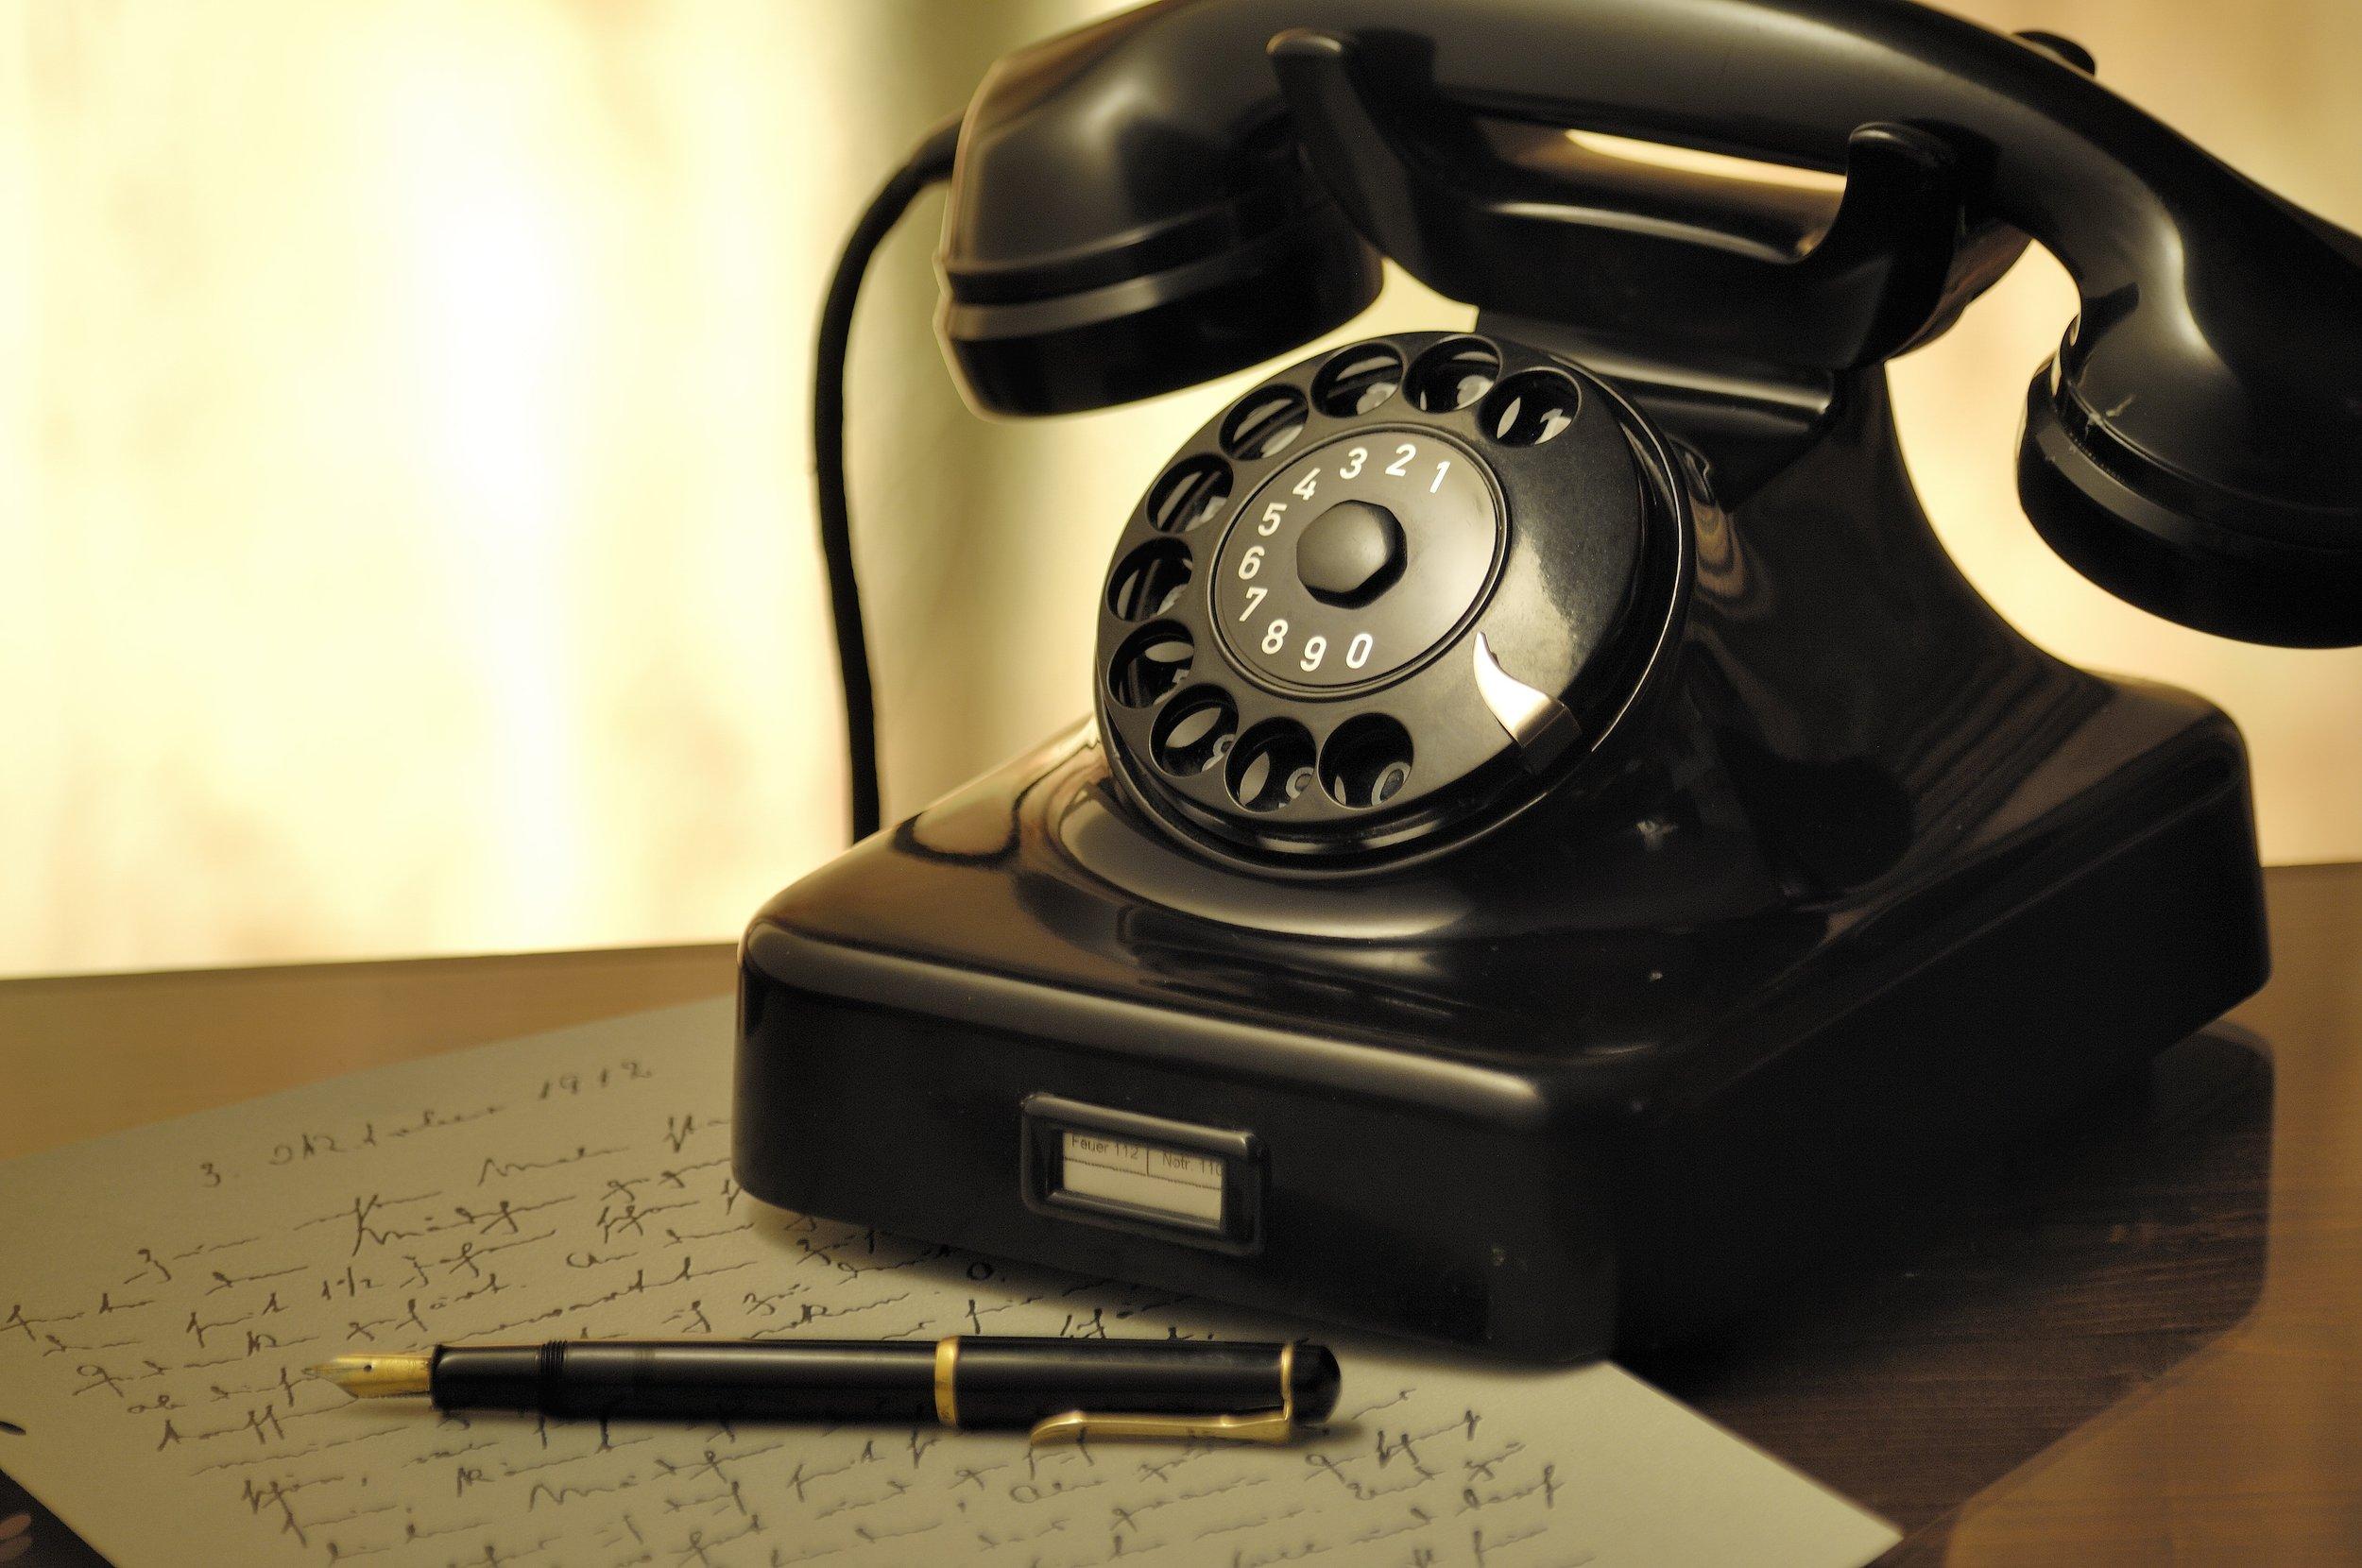 antique-desk-dial-47319.jpg